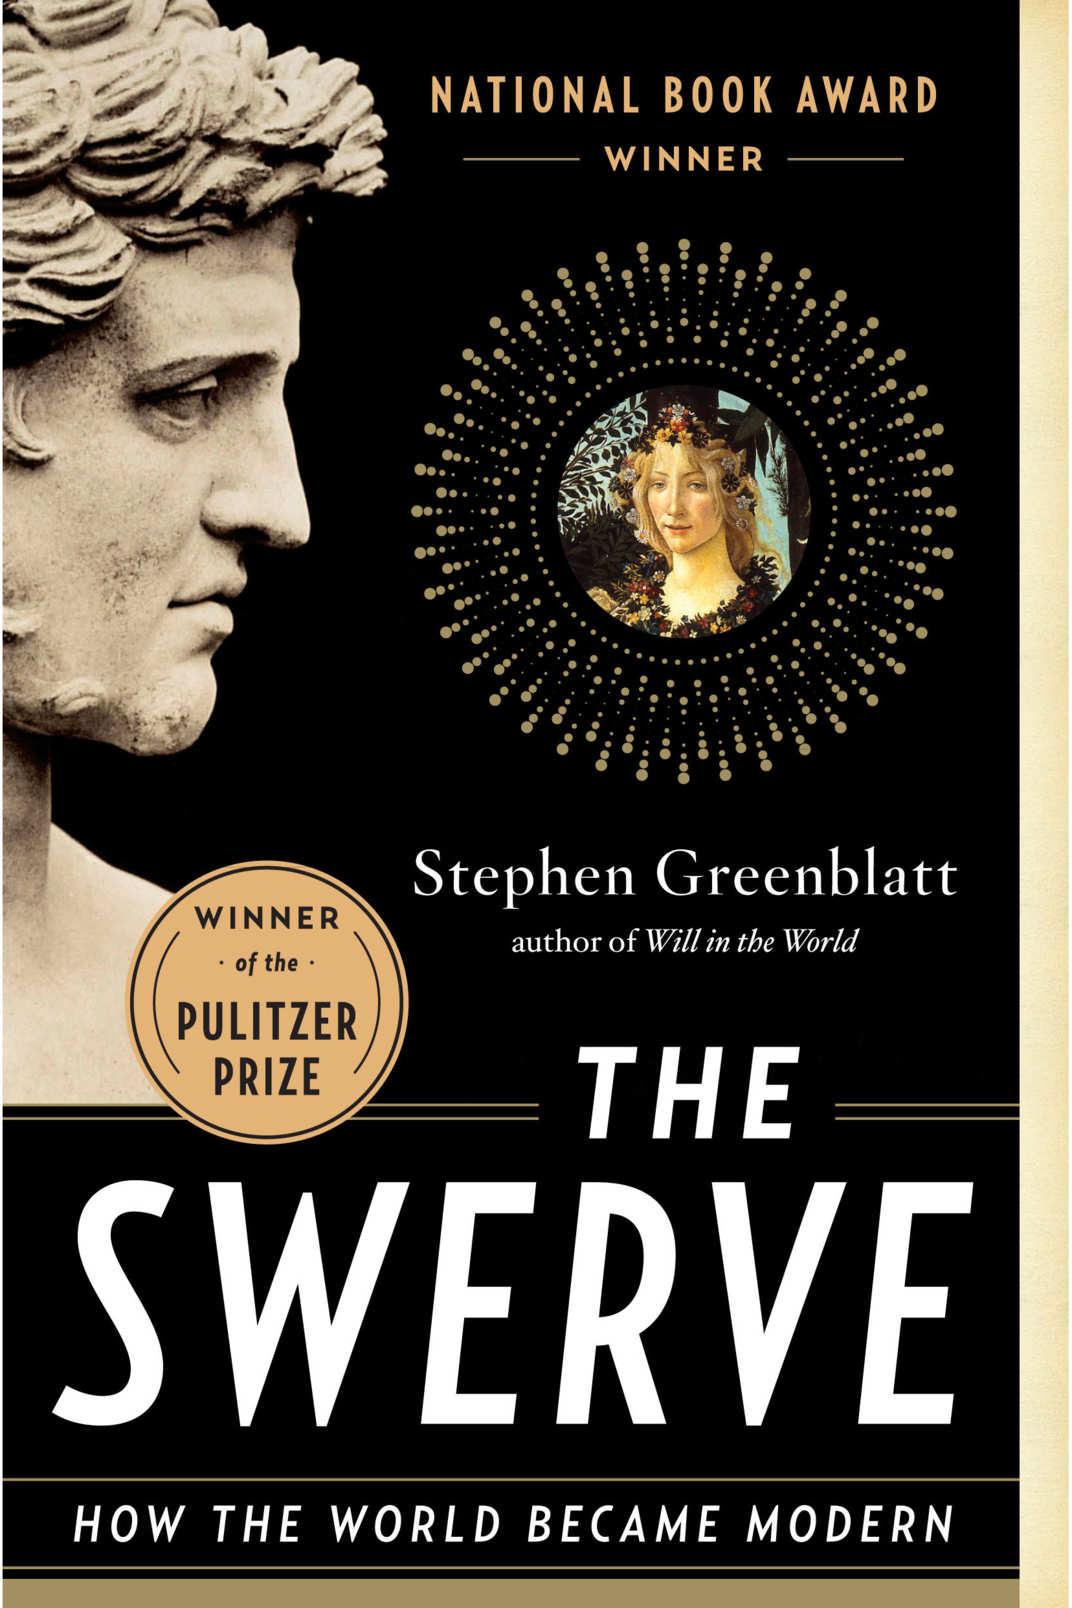 <em>The Swerve</em> by Stephen Greenblatt